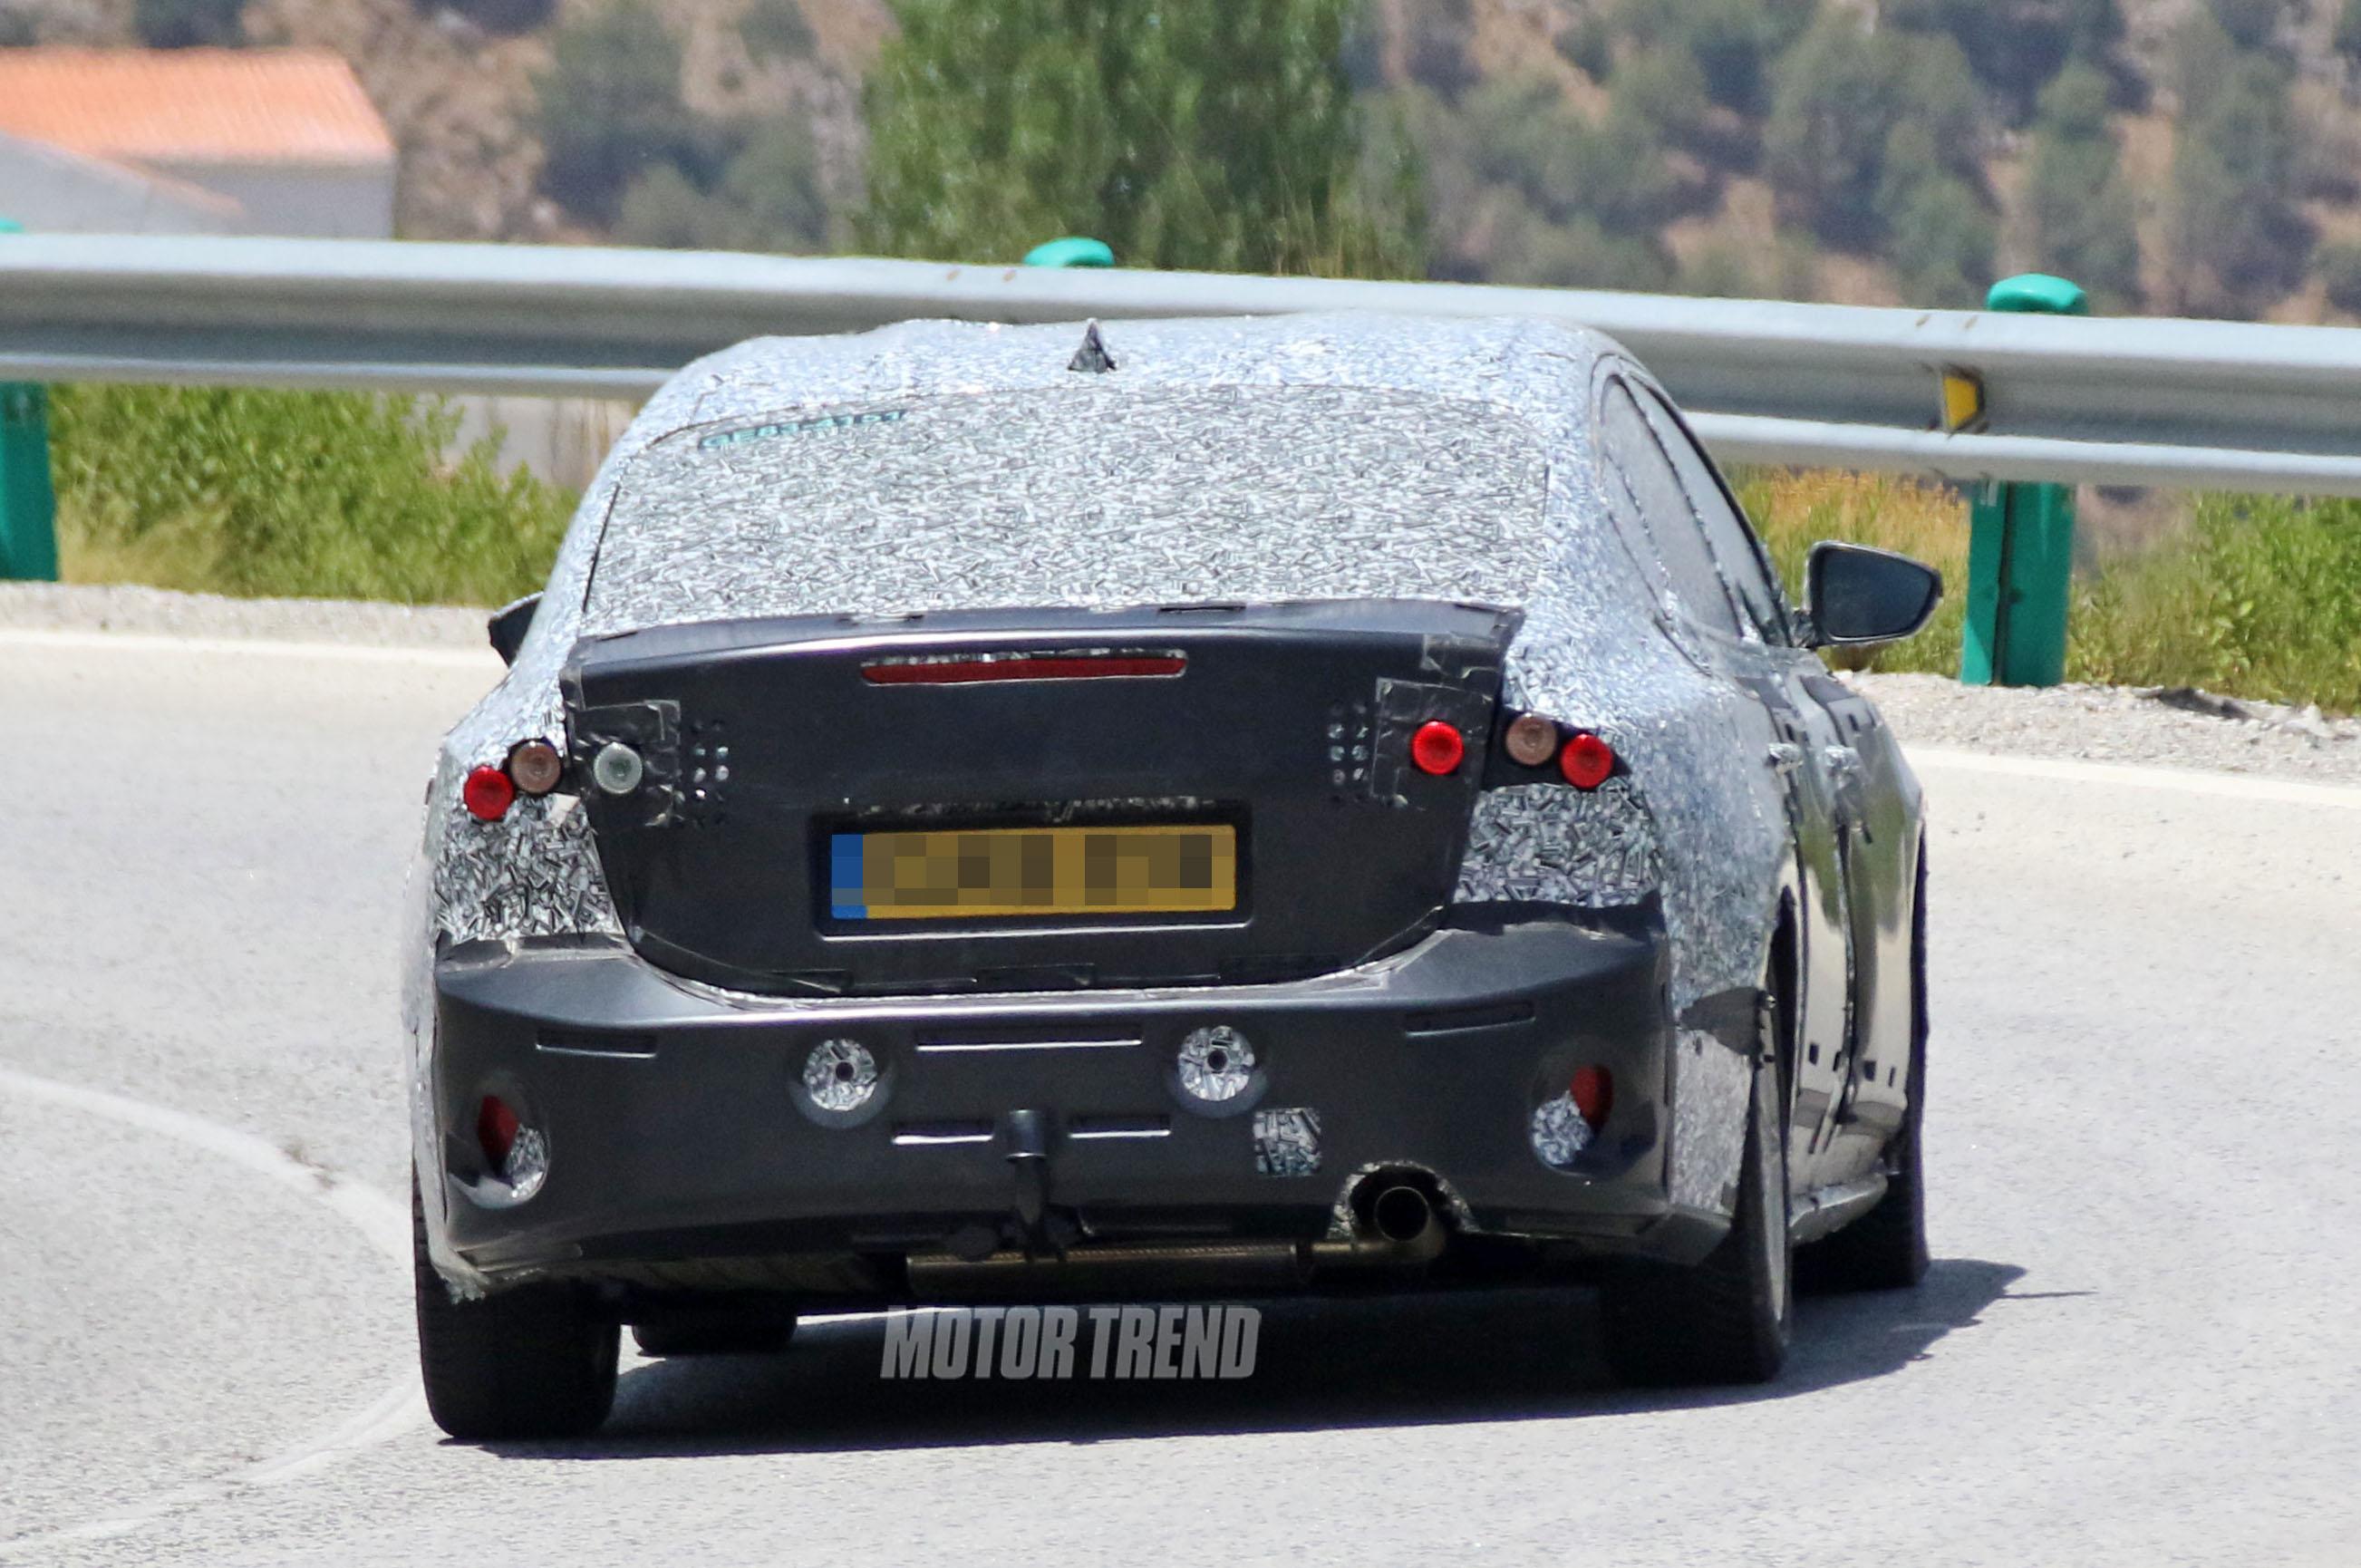 Next Gen Ford Focus Rear Look